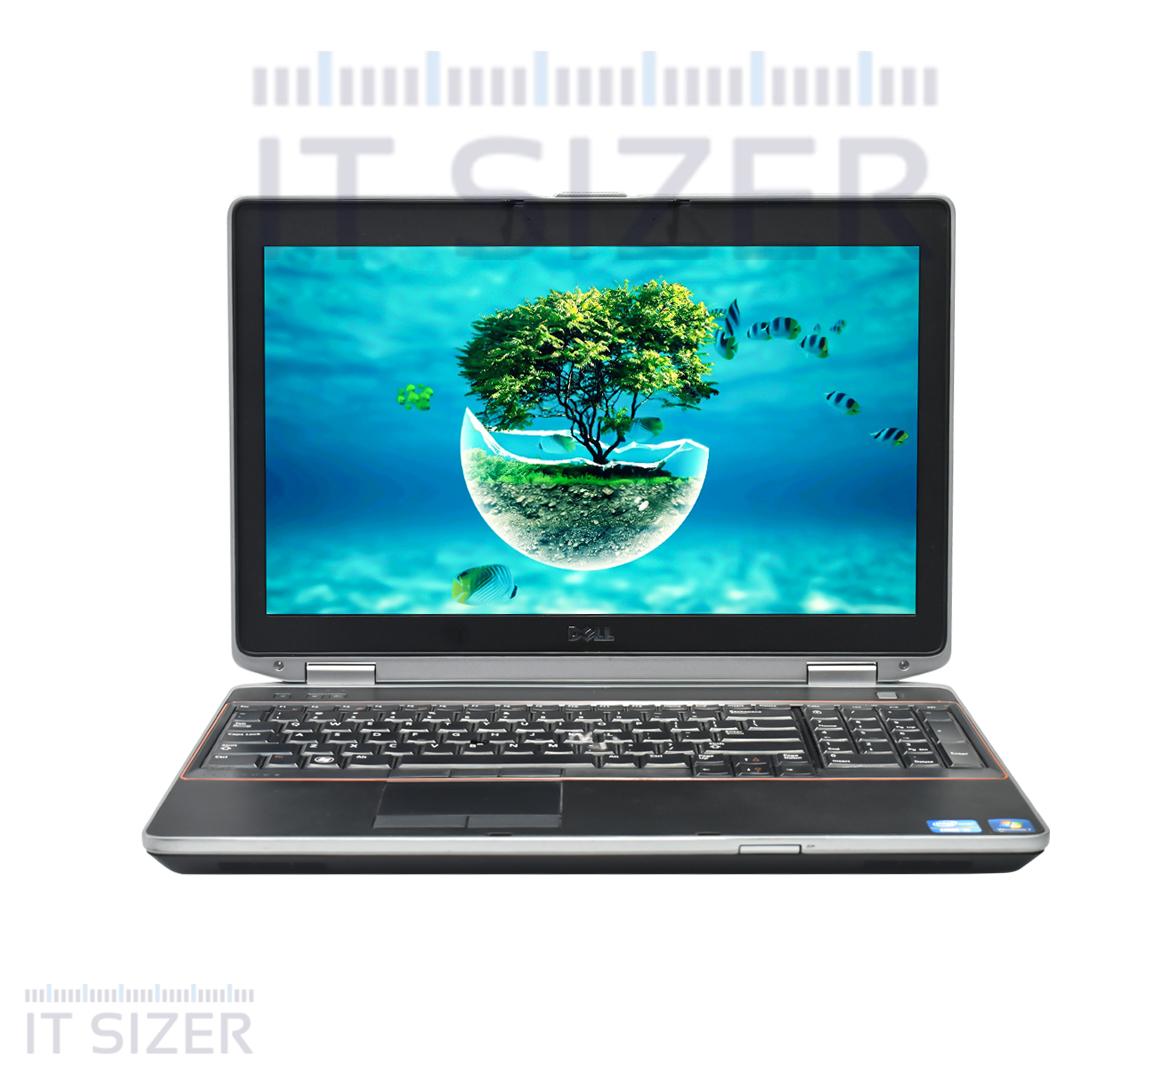 Dell Latitude E6520 Business Laptop, Intel Core i5-2520M CPU, 8GB DDR3 SODIMM RAM, 256GB SSD 2.5, 15 inch Display, Windows 10 Pro (Renewed)